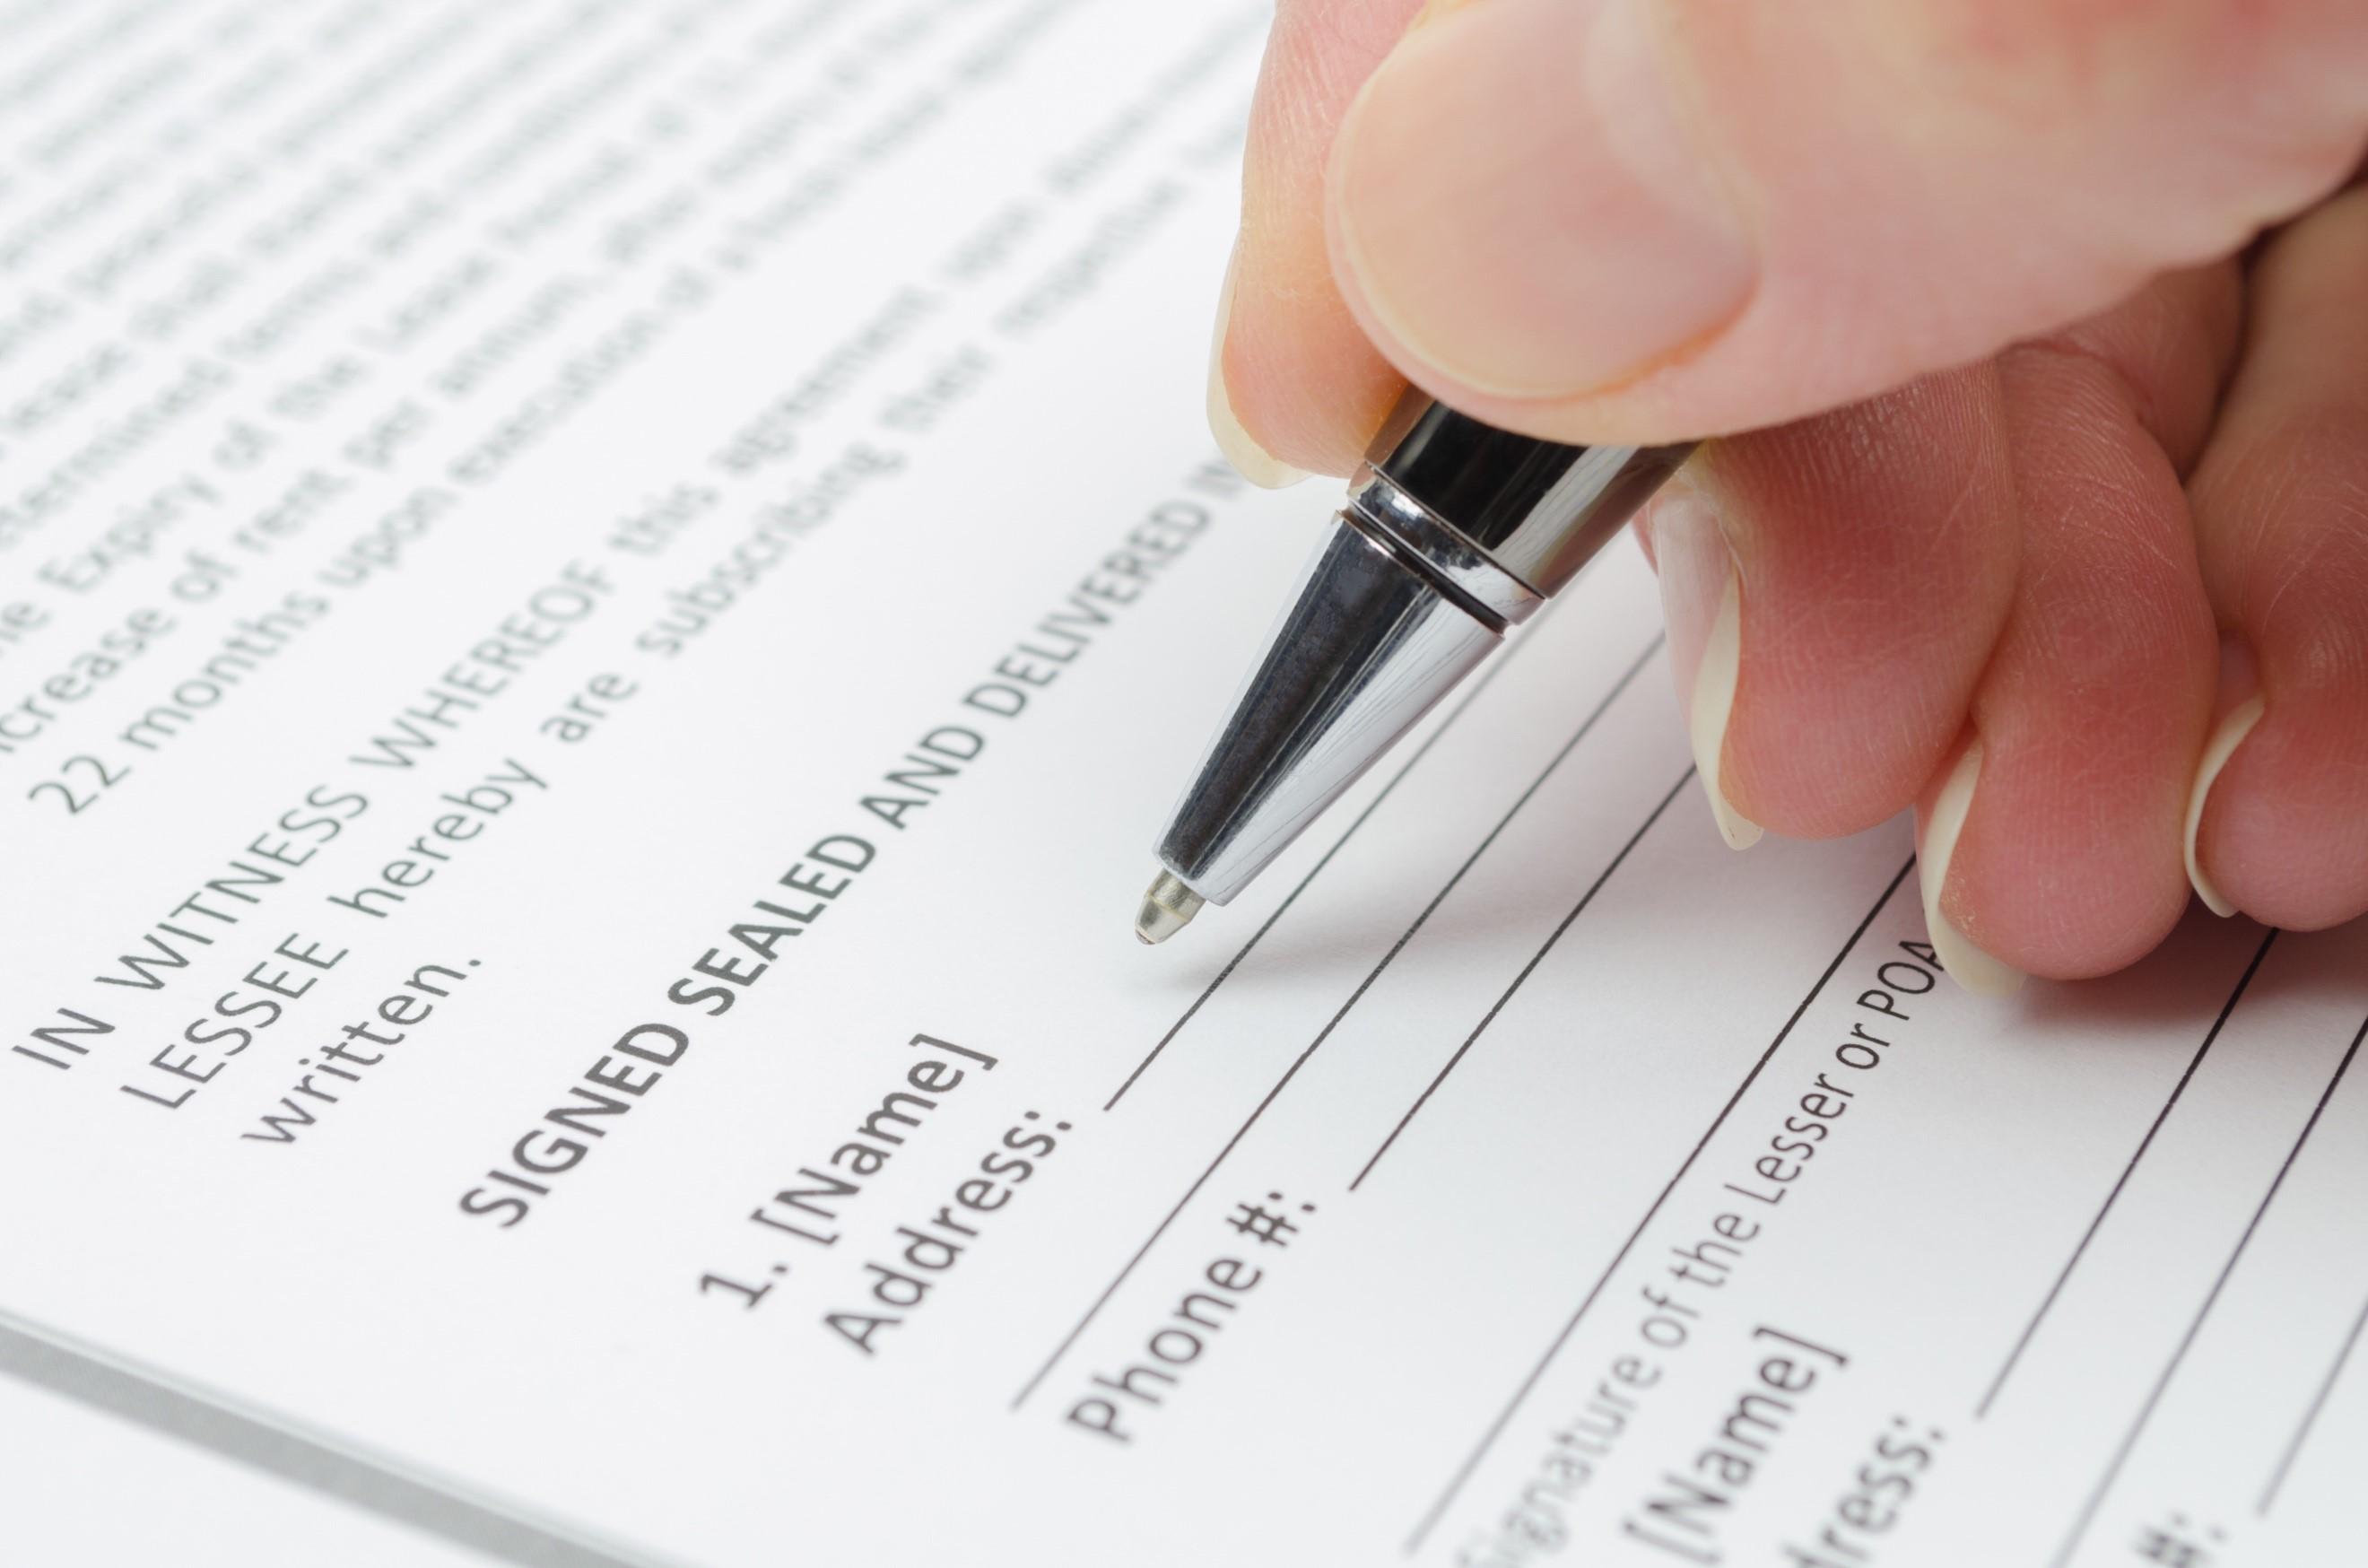 Eazy close protection program for Real Estate Scured Cnsumer Lending Transactions